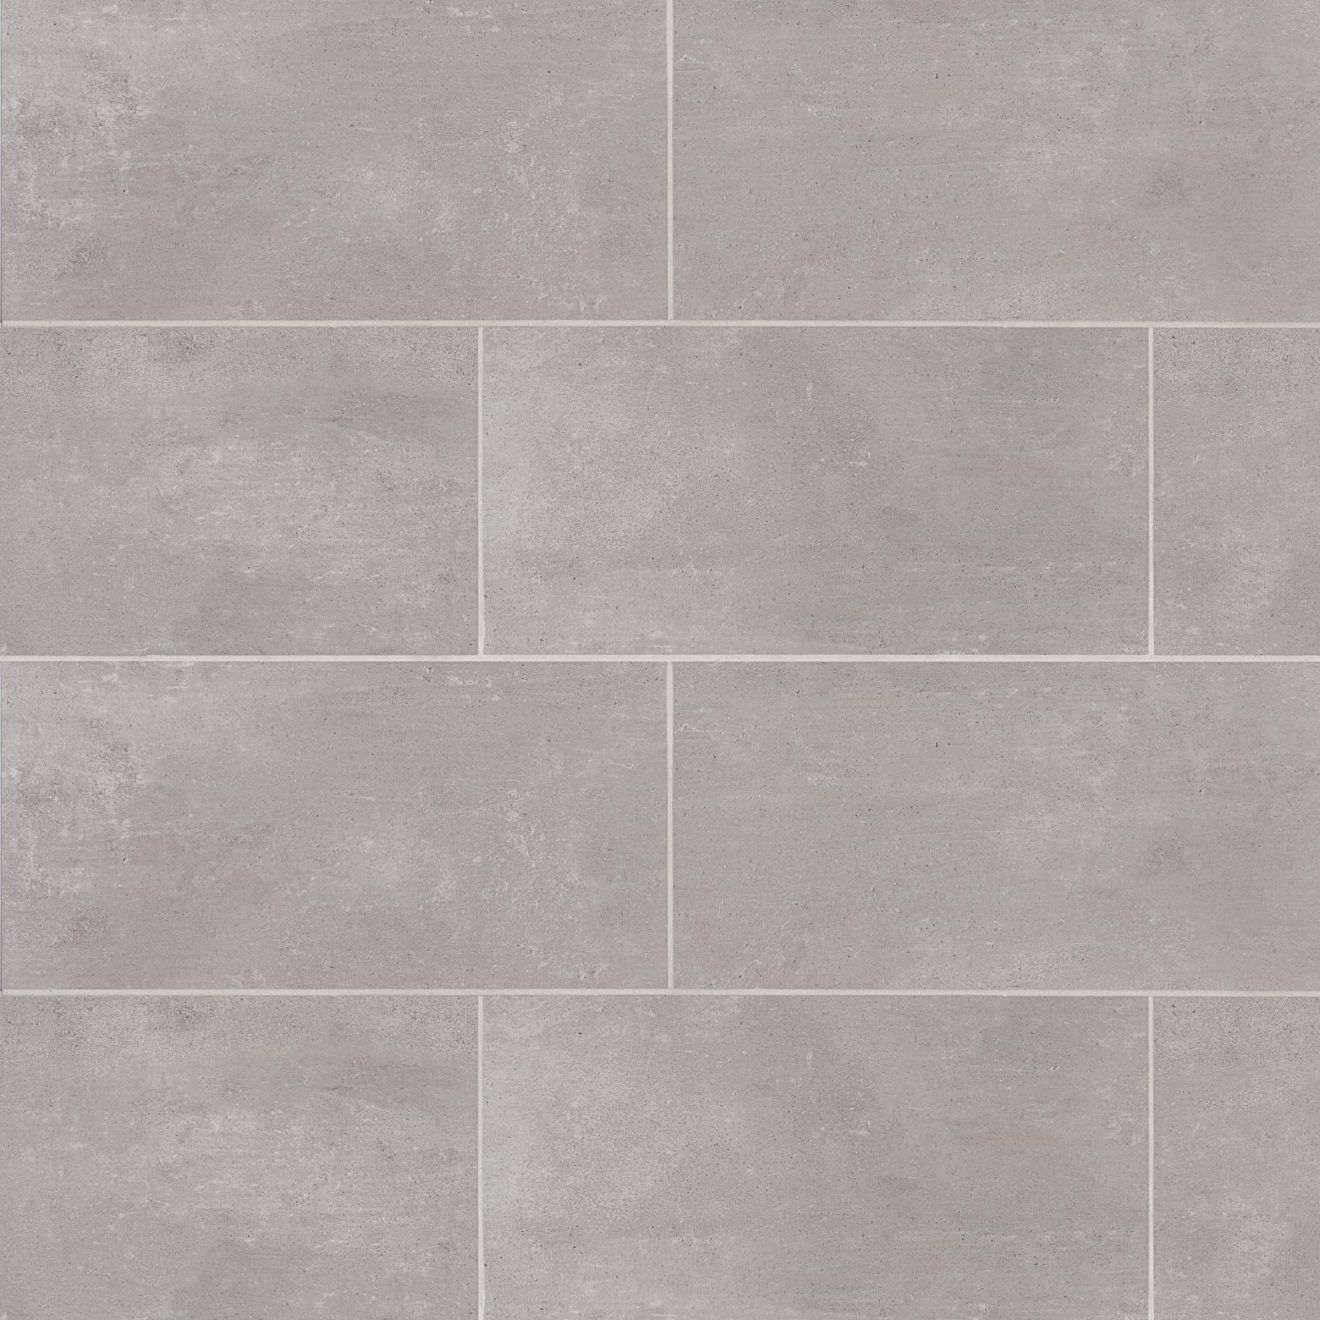 Simply Modern 12 X 24 Floor Wall Tile In Grey